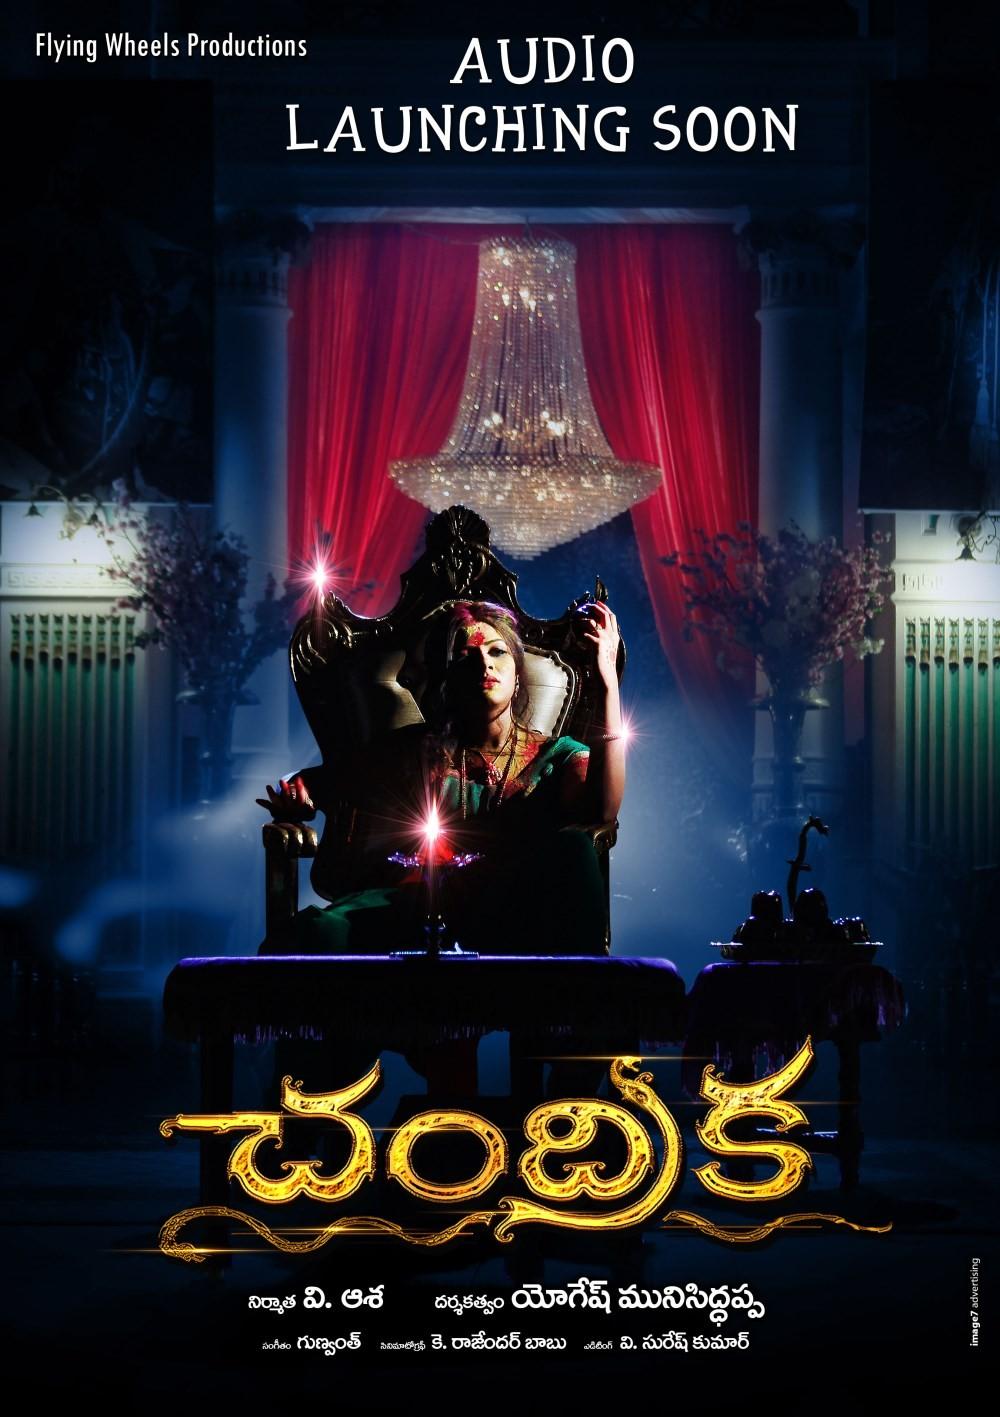 Chandrika Movie Posters,Chandrika,telugu movie Chandrika,Arjun,Kamna Jethmalani,Srimukhi,telugu movie Chandrika poster,Chandrika movie poster,Chandrika movie pics,Chandrika movie images,Chandrika movie stills